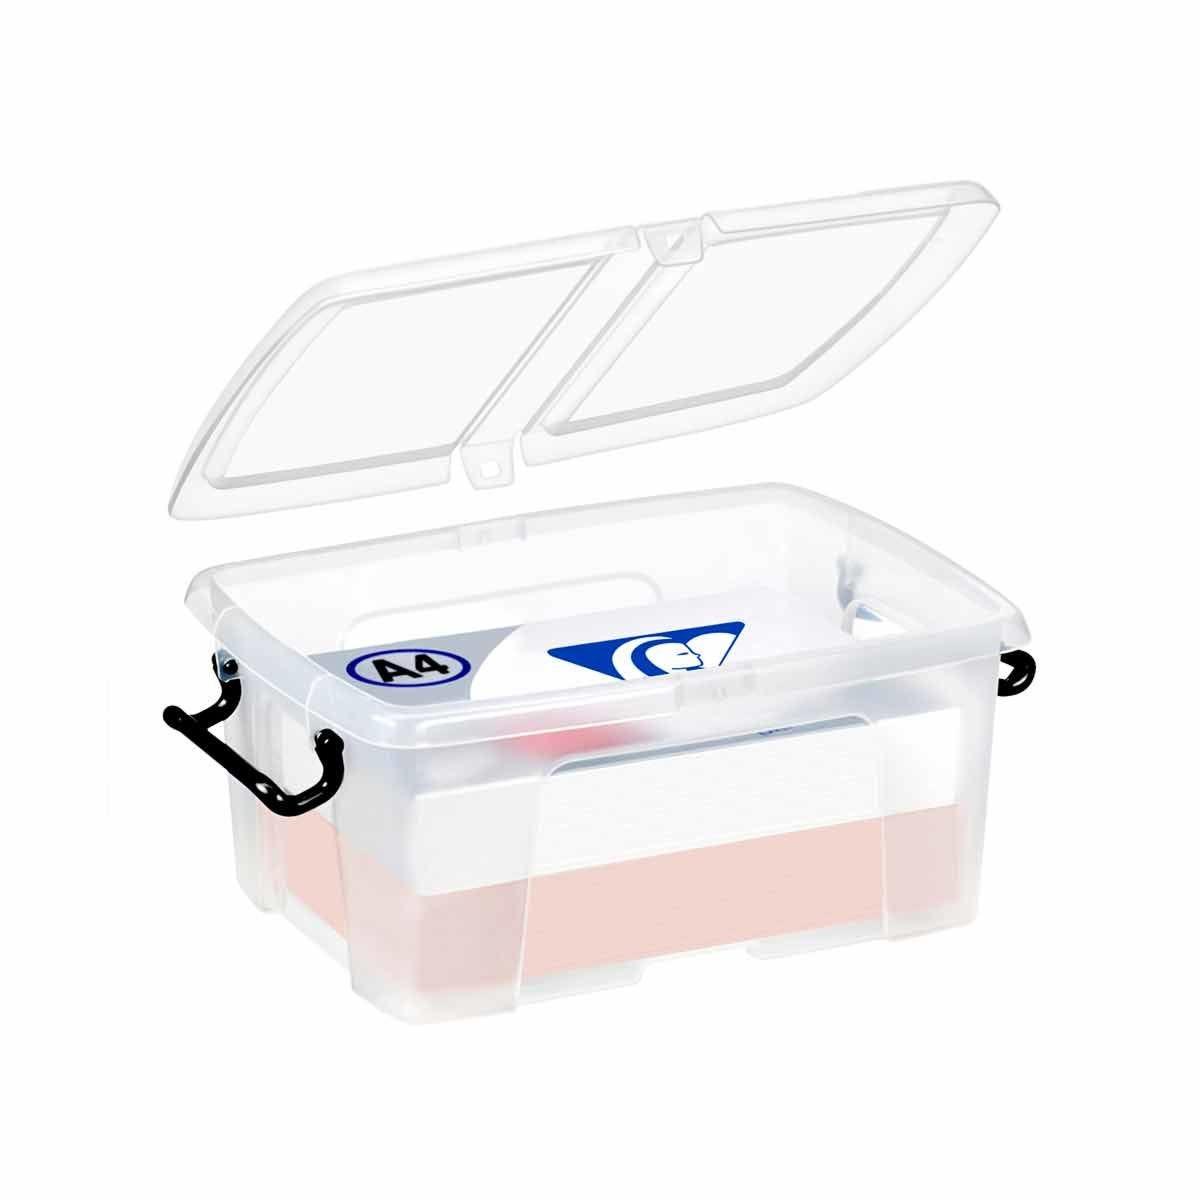 Strata Smart Plastic Storage Box with Folding Lid 12 Litre